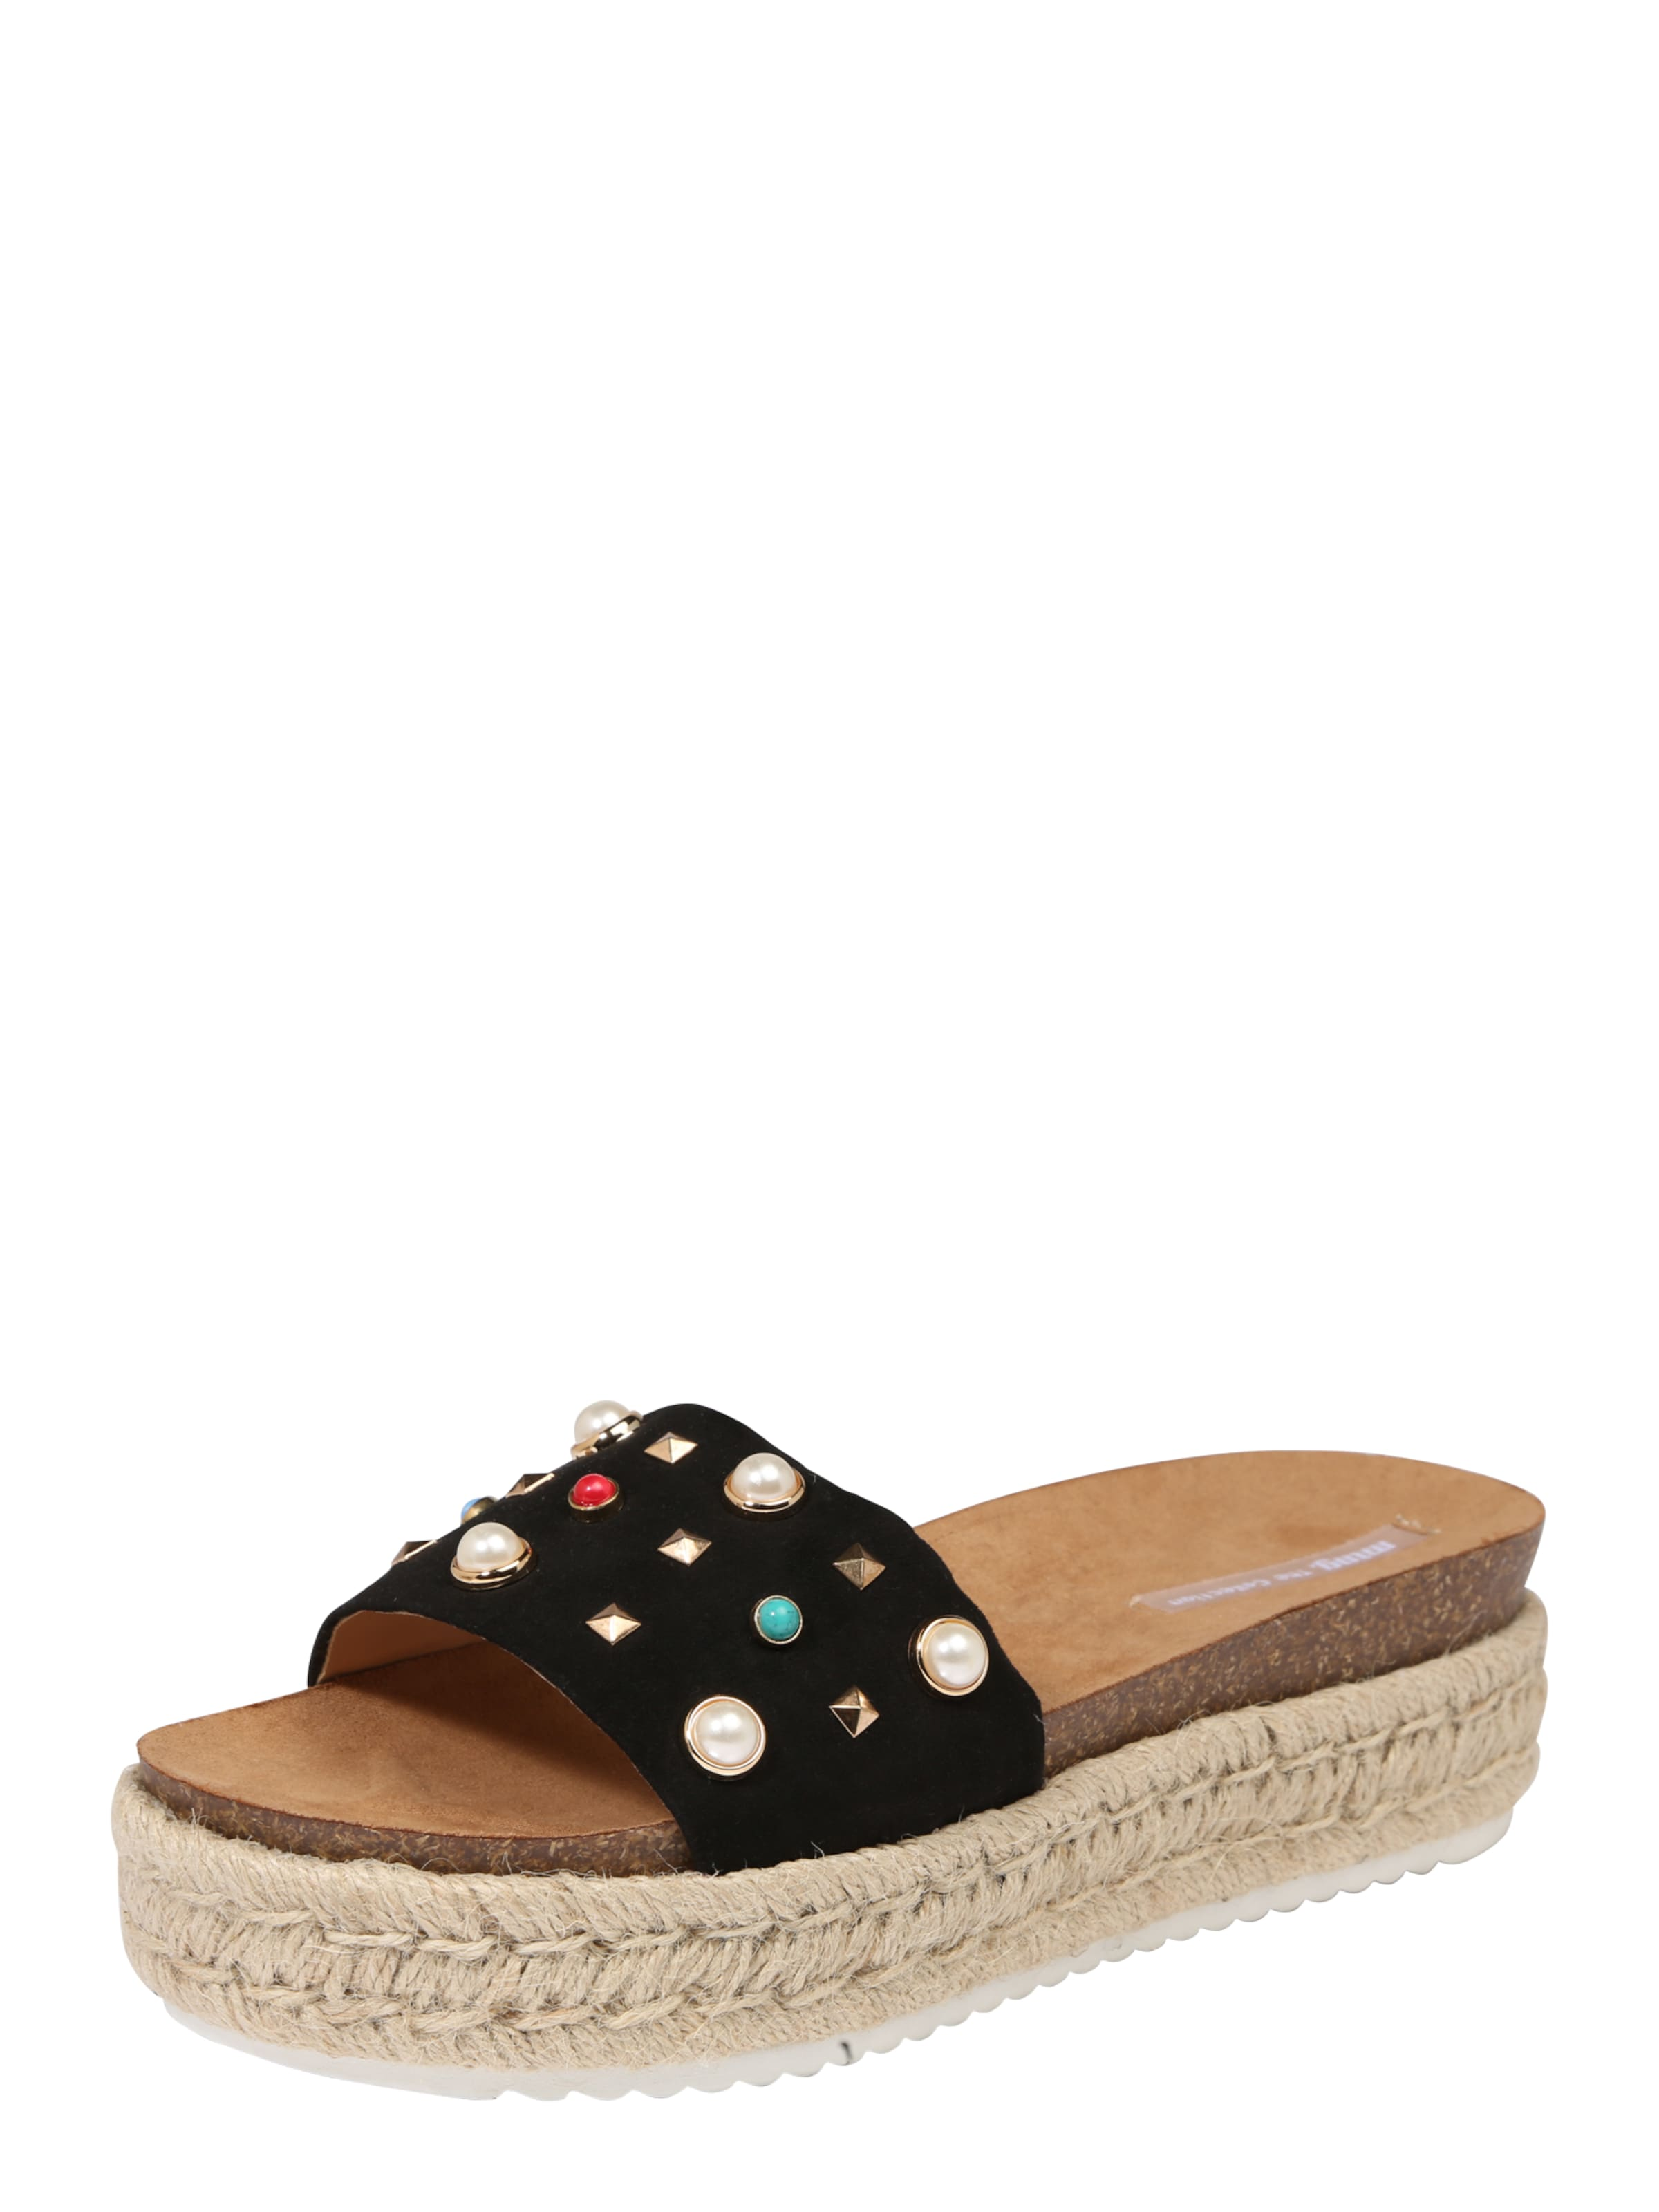 Haltbare   Mode billige Schuhe MTNG   Haltbare Pantoletten 'PERLA' Schuhe Gut getragene Schuhe ee8dcb